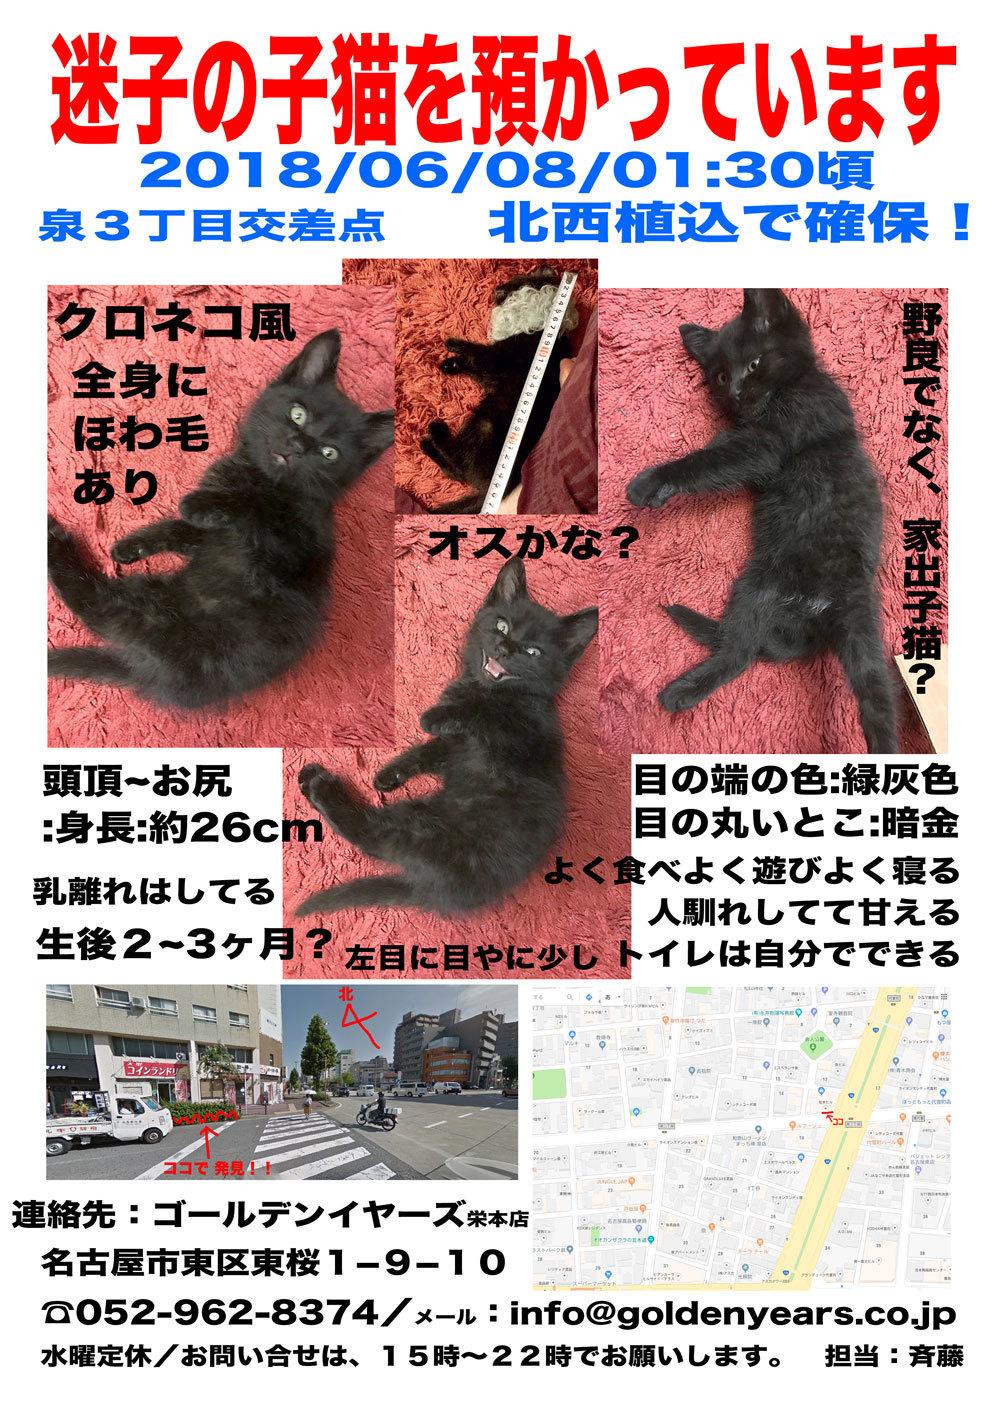 KittyWanted_BL_web.jpg